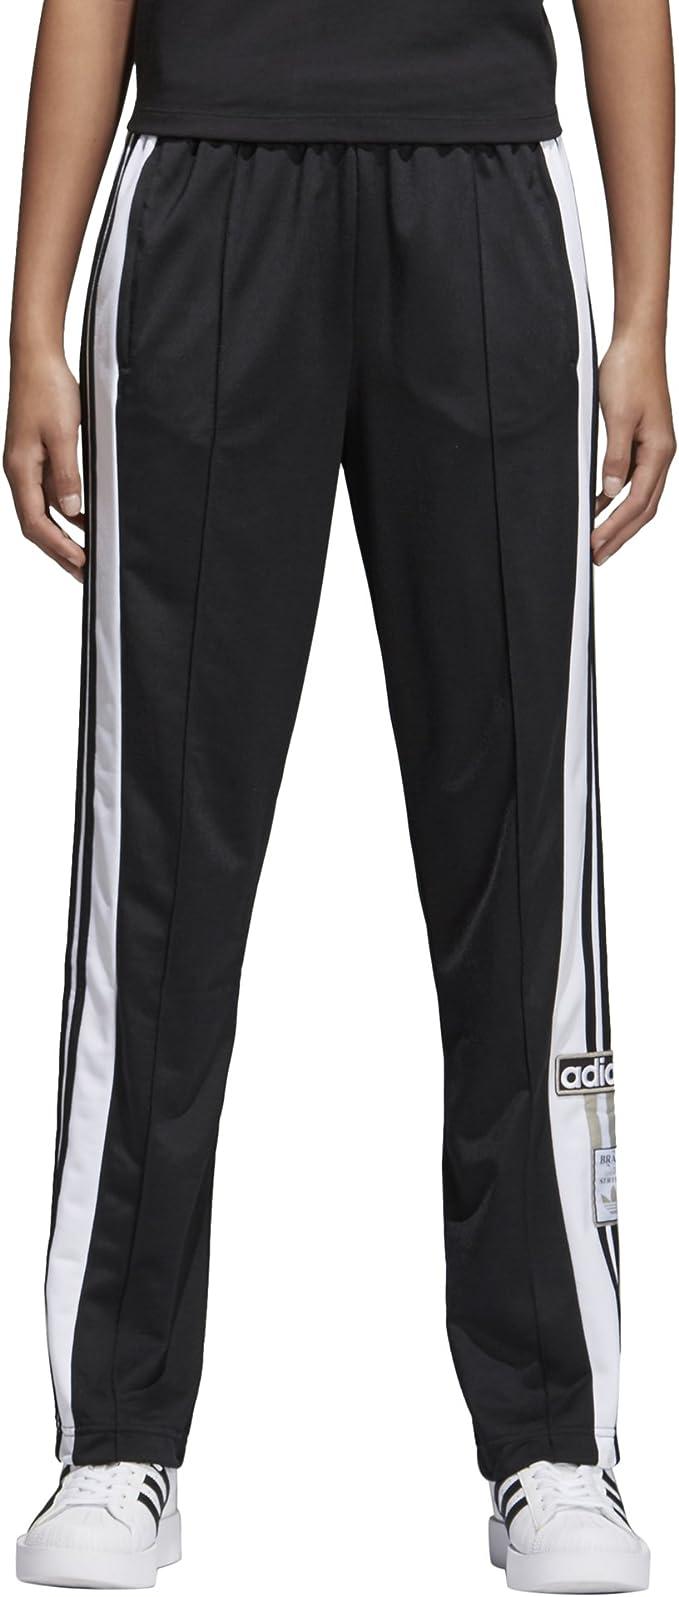 : adidas Originals Adibreak Pantalones de